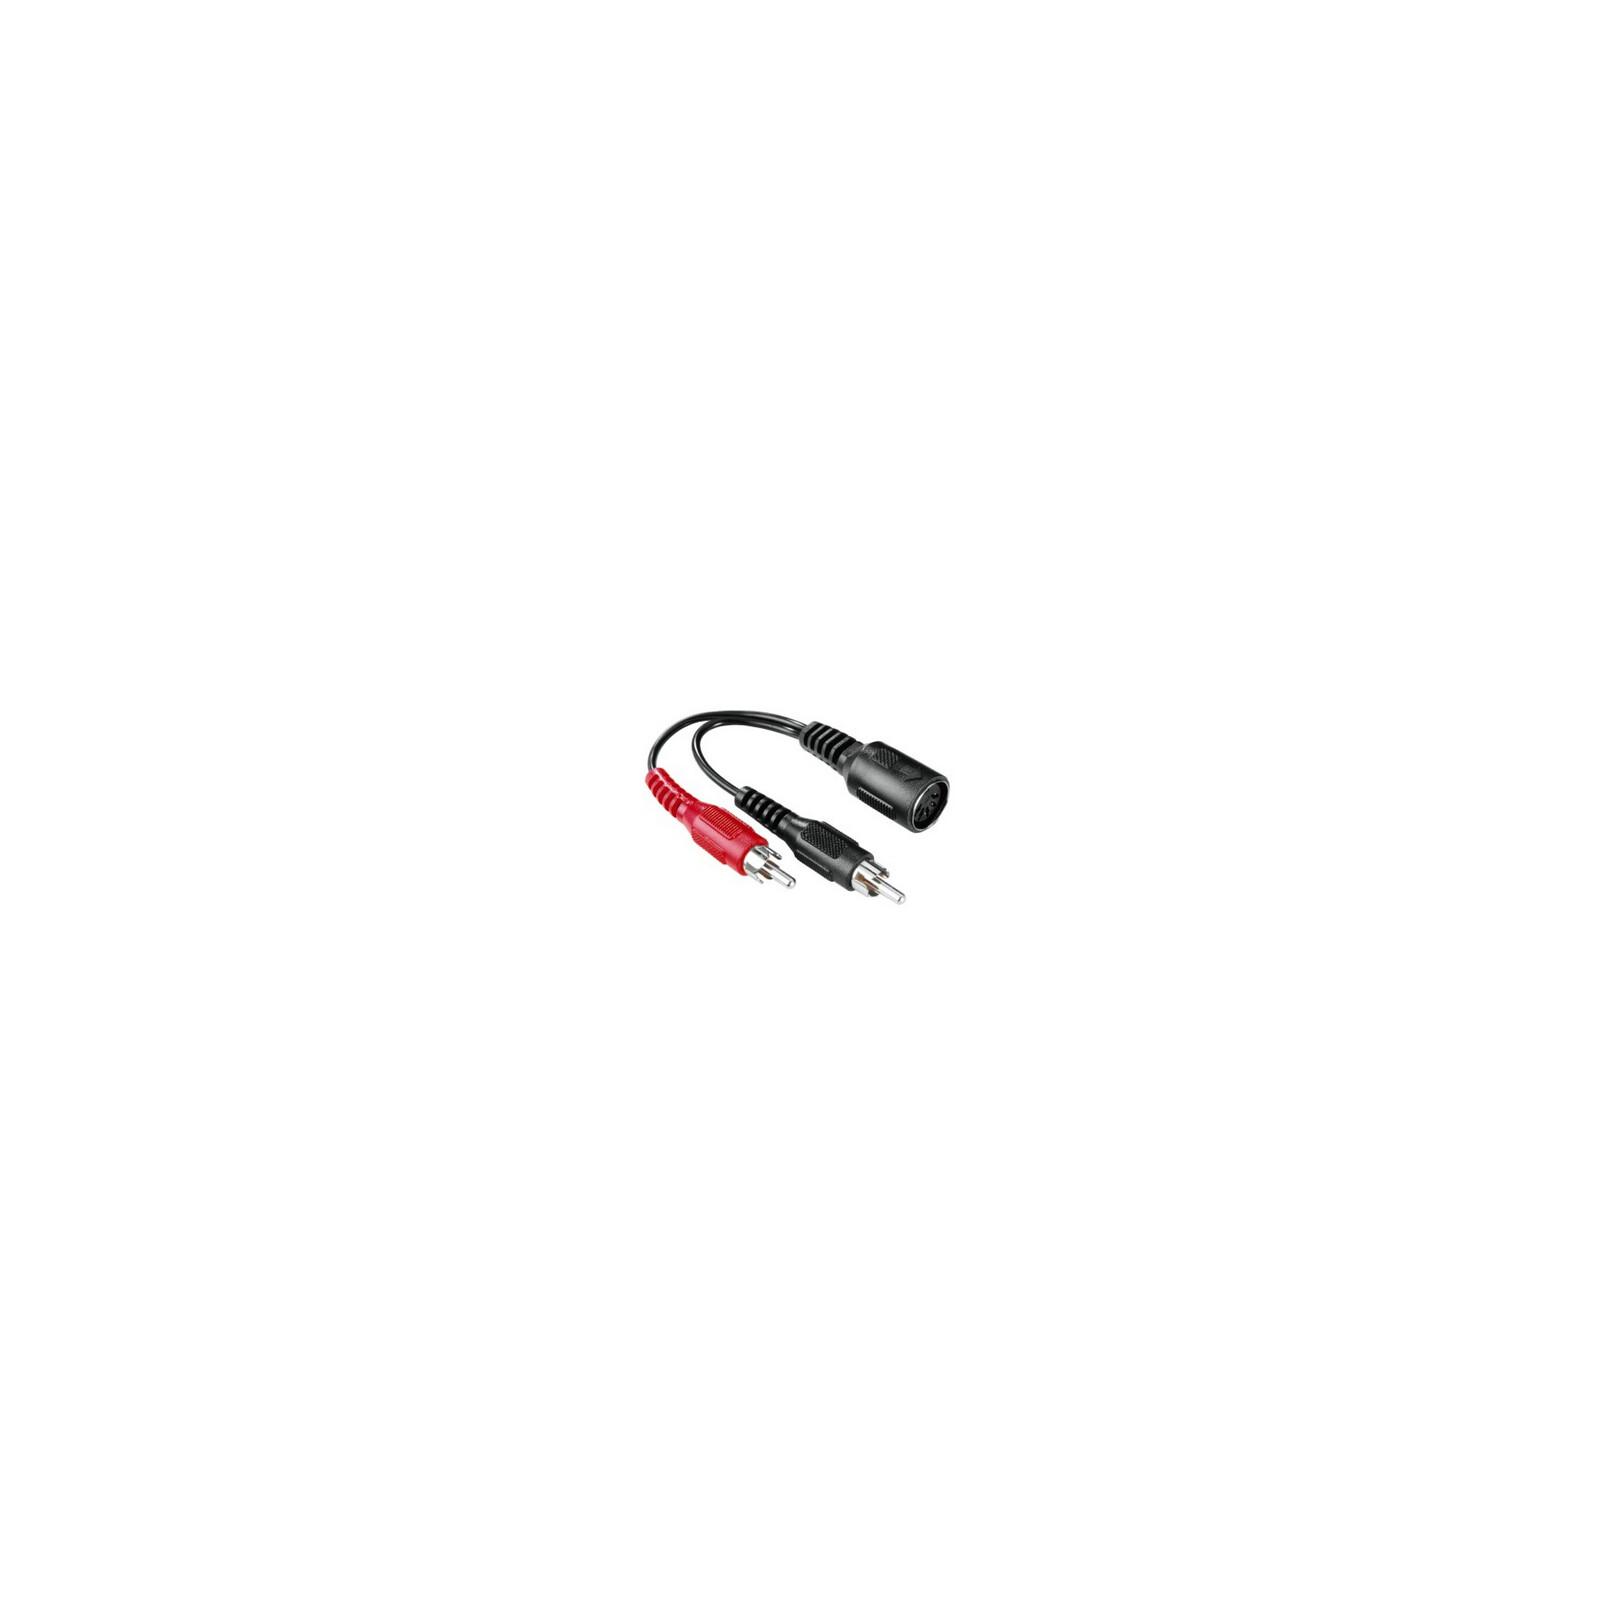 Hama Audio-Adapter 2 Cinch-Stecker 5-pol.-DIN-Kupplung